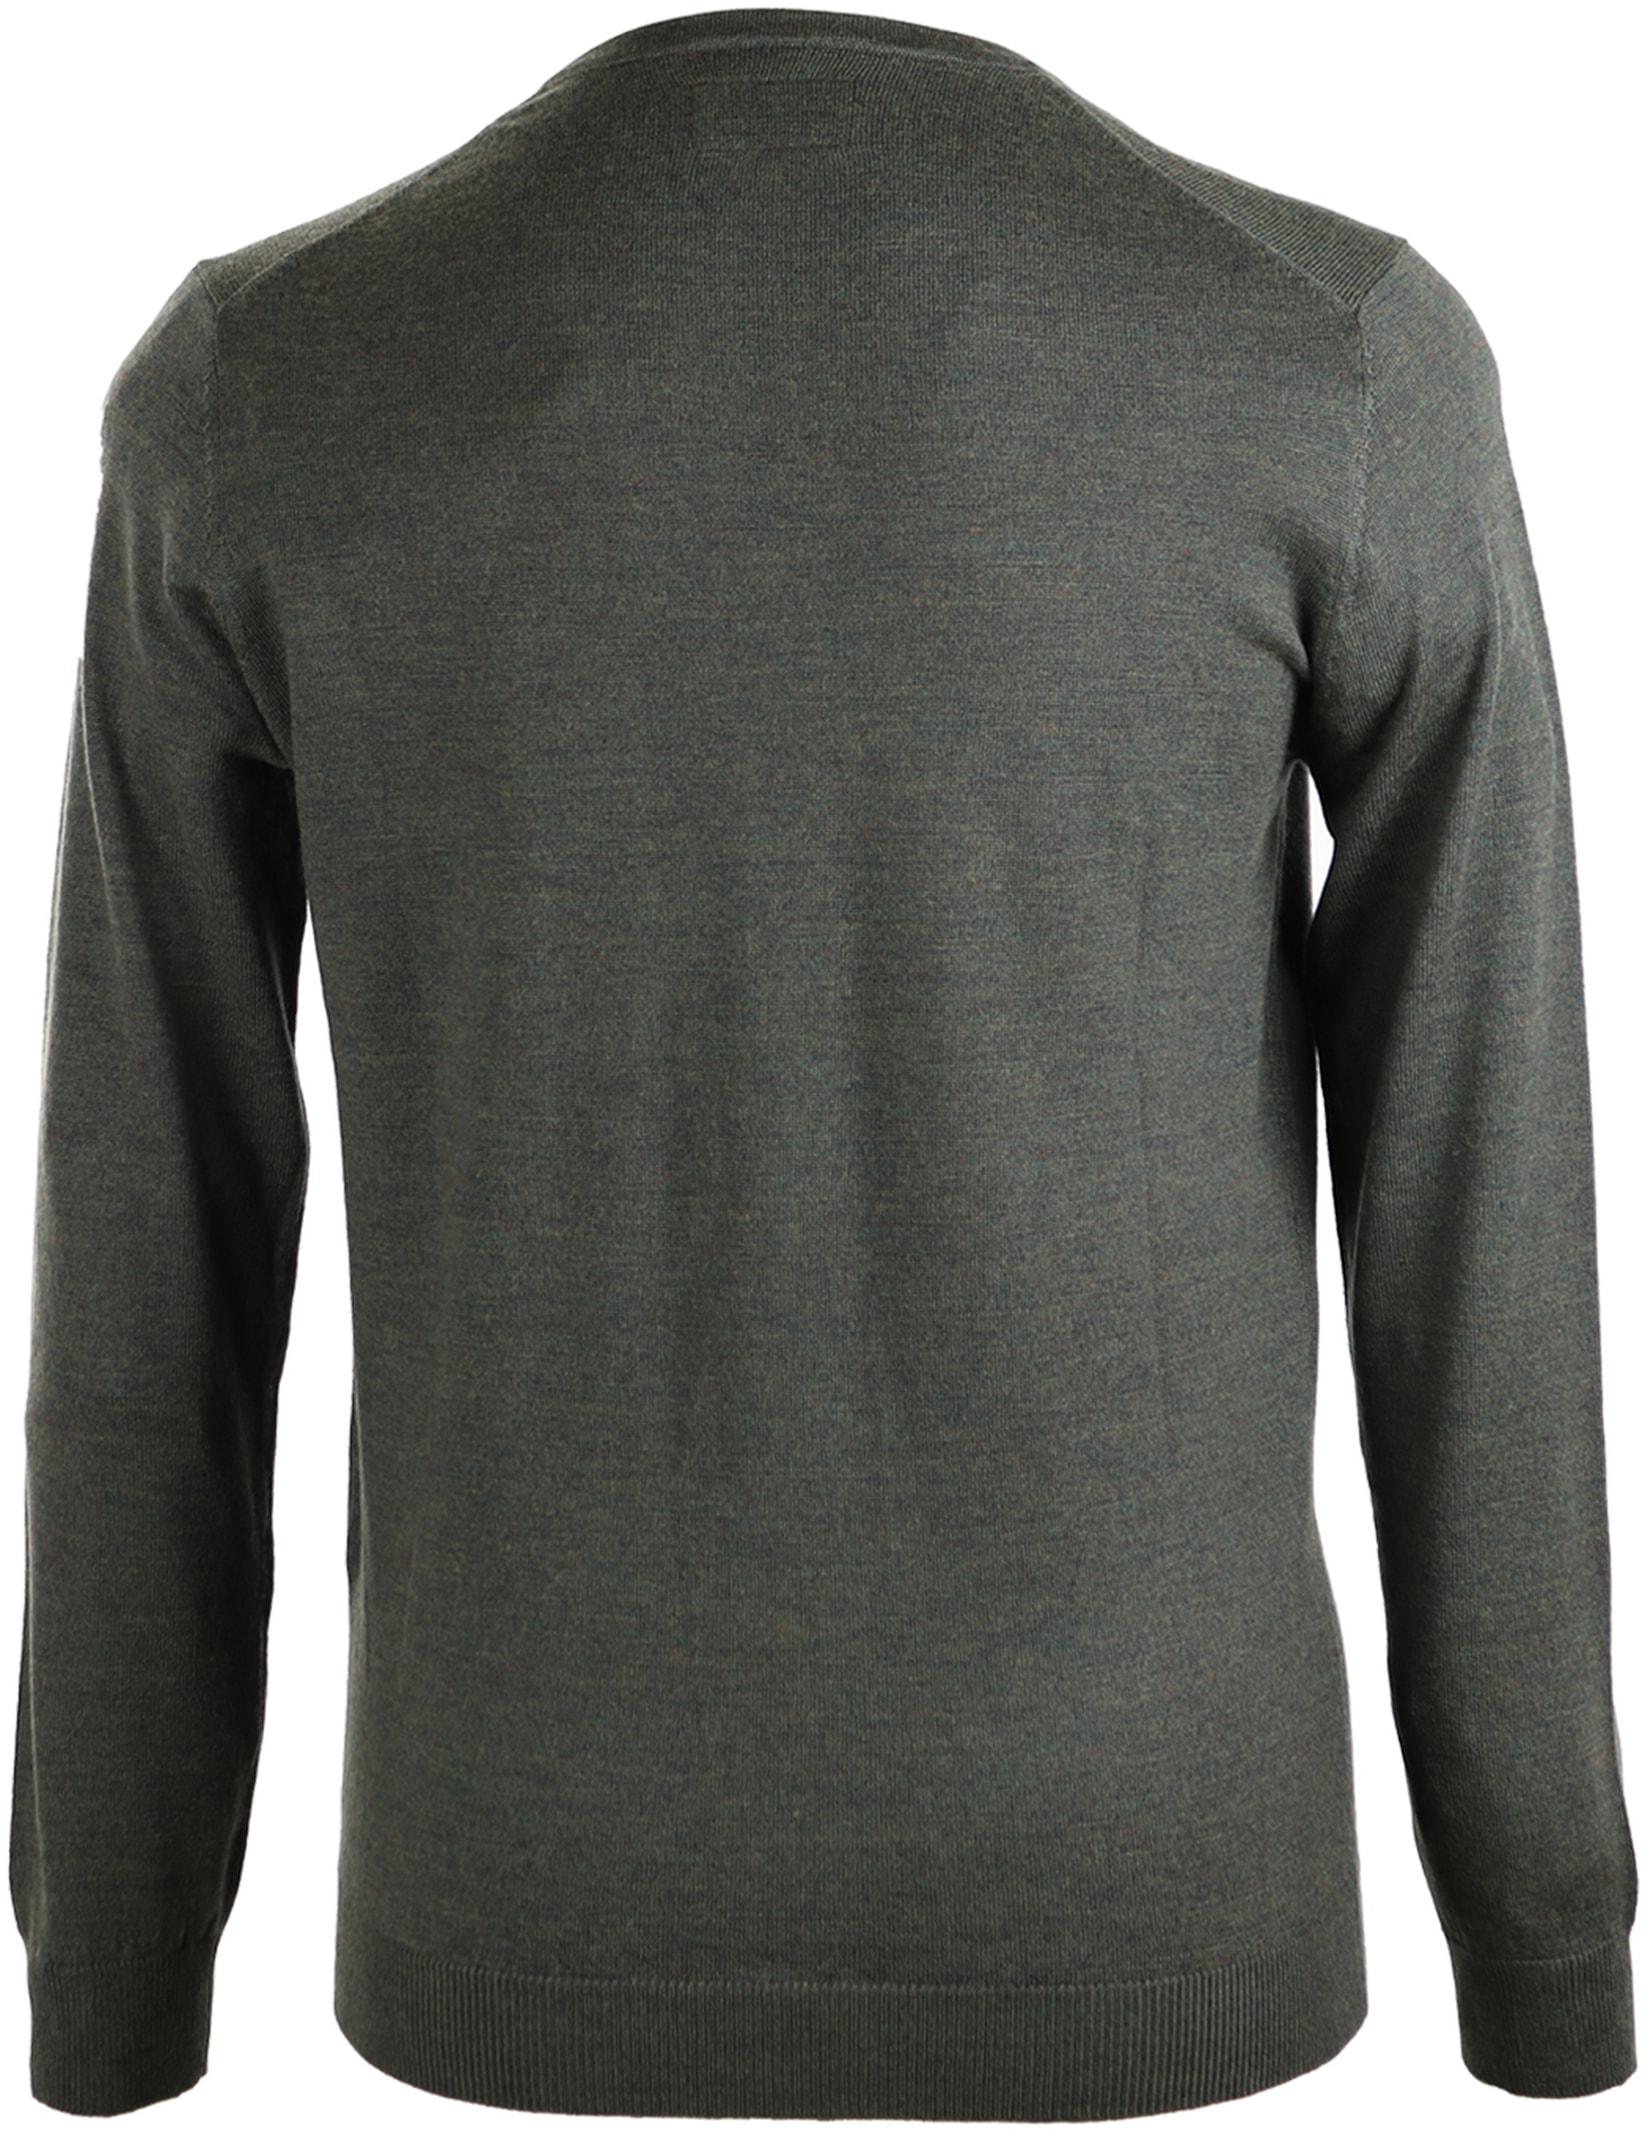 Suitable Pullover Merino Wool Dark Green foto 1